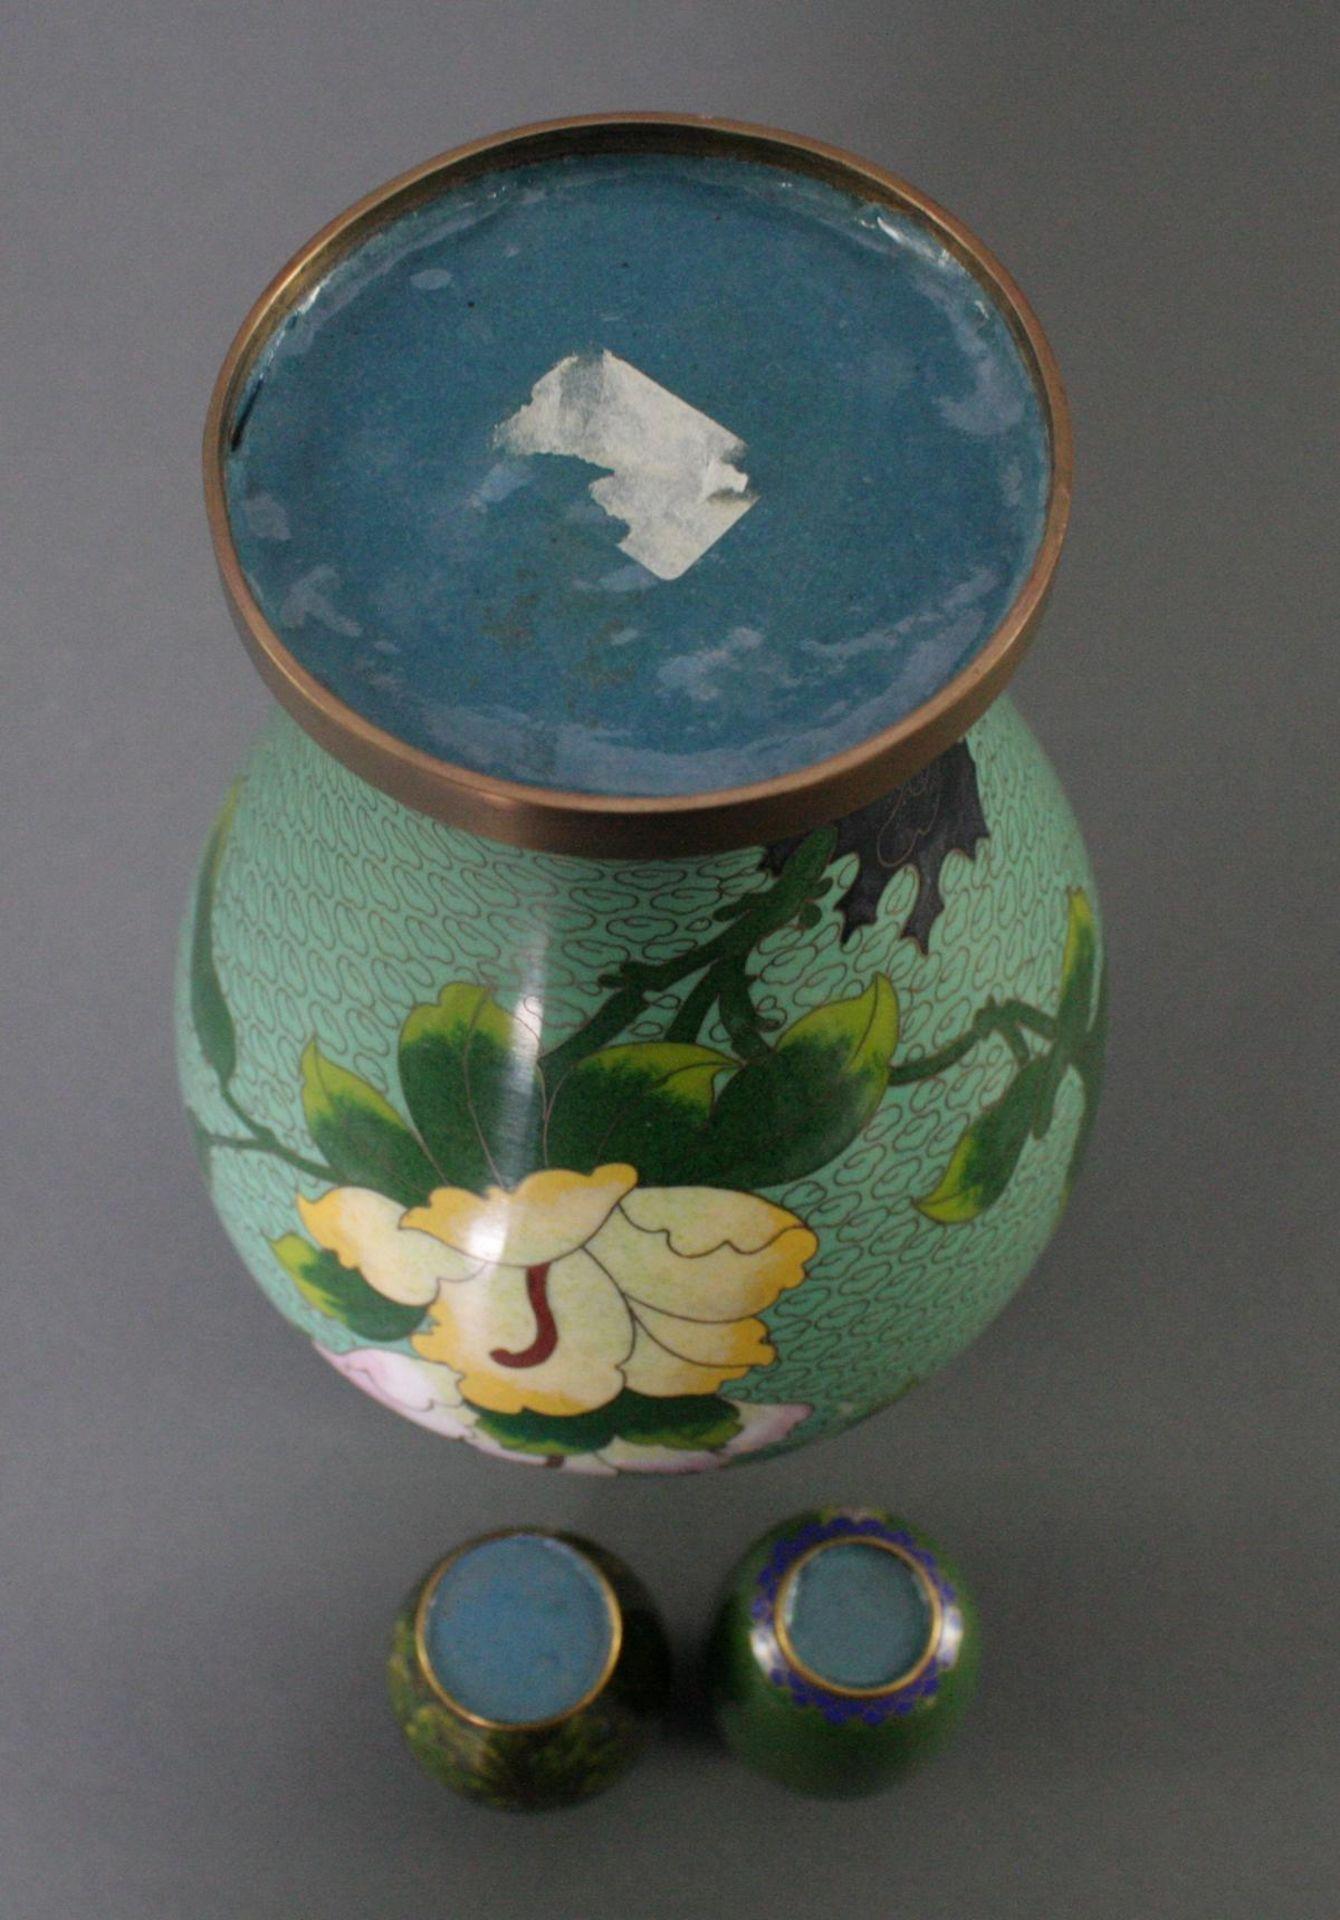 Drei Cloisonné Vasen, China - Bild 4 aus 4